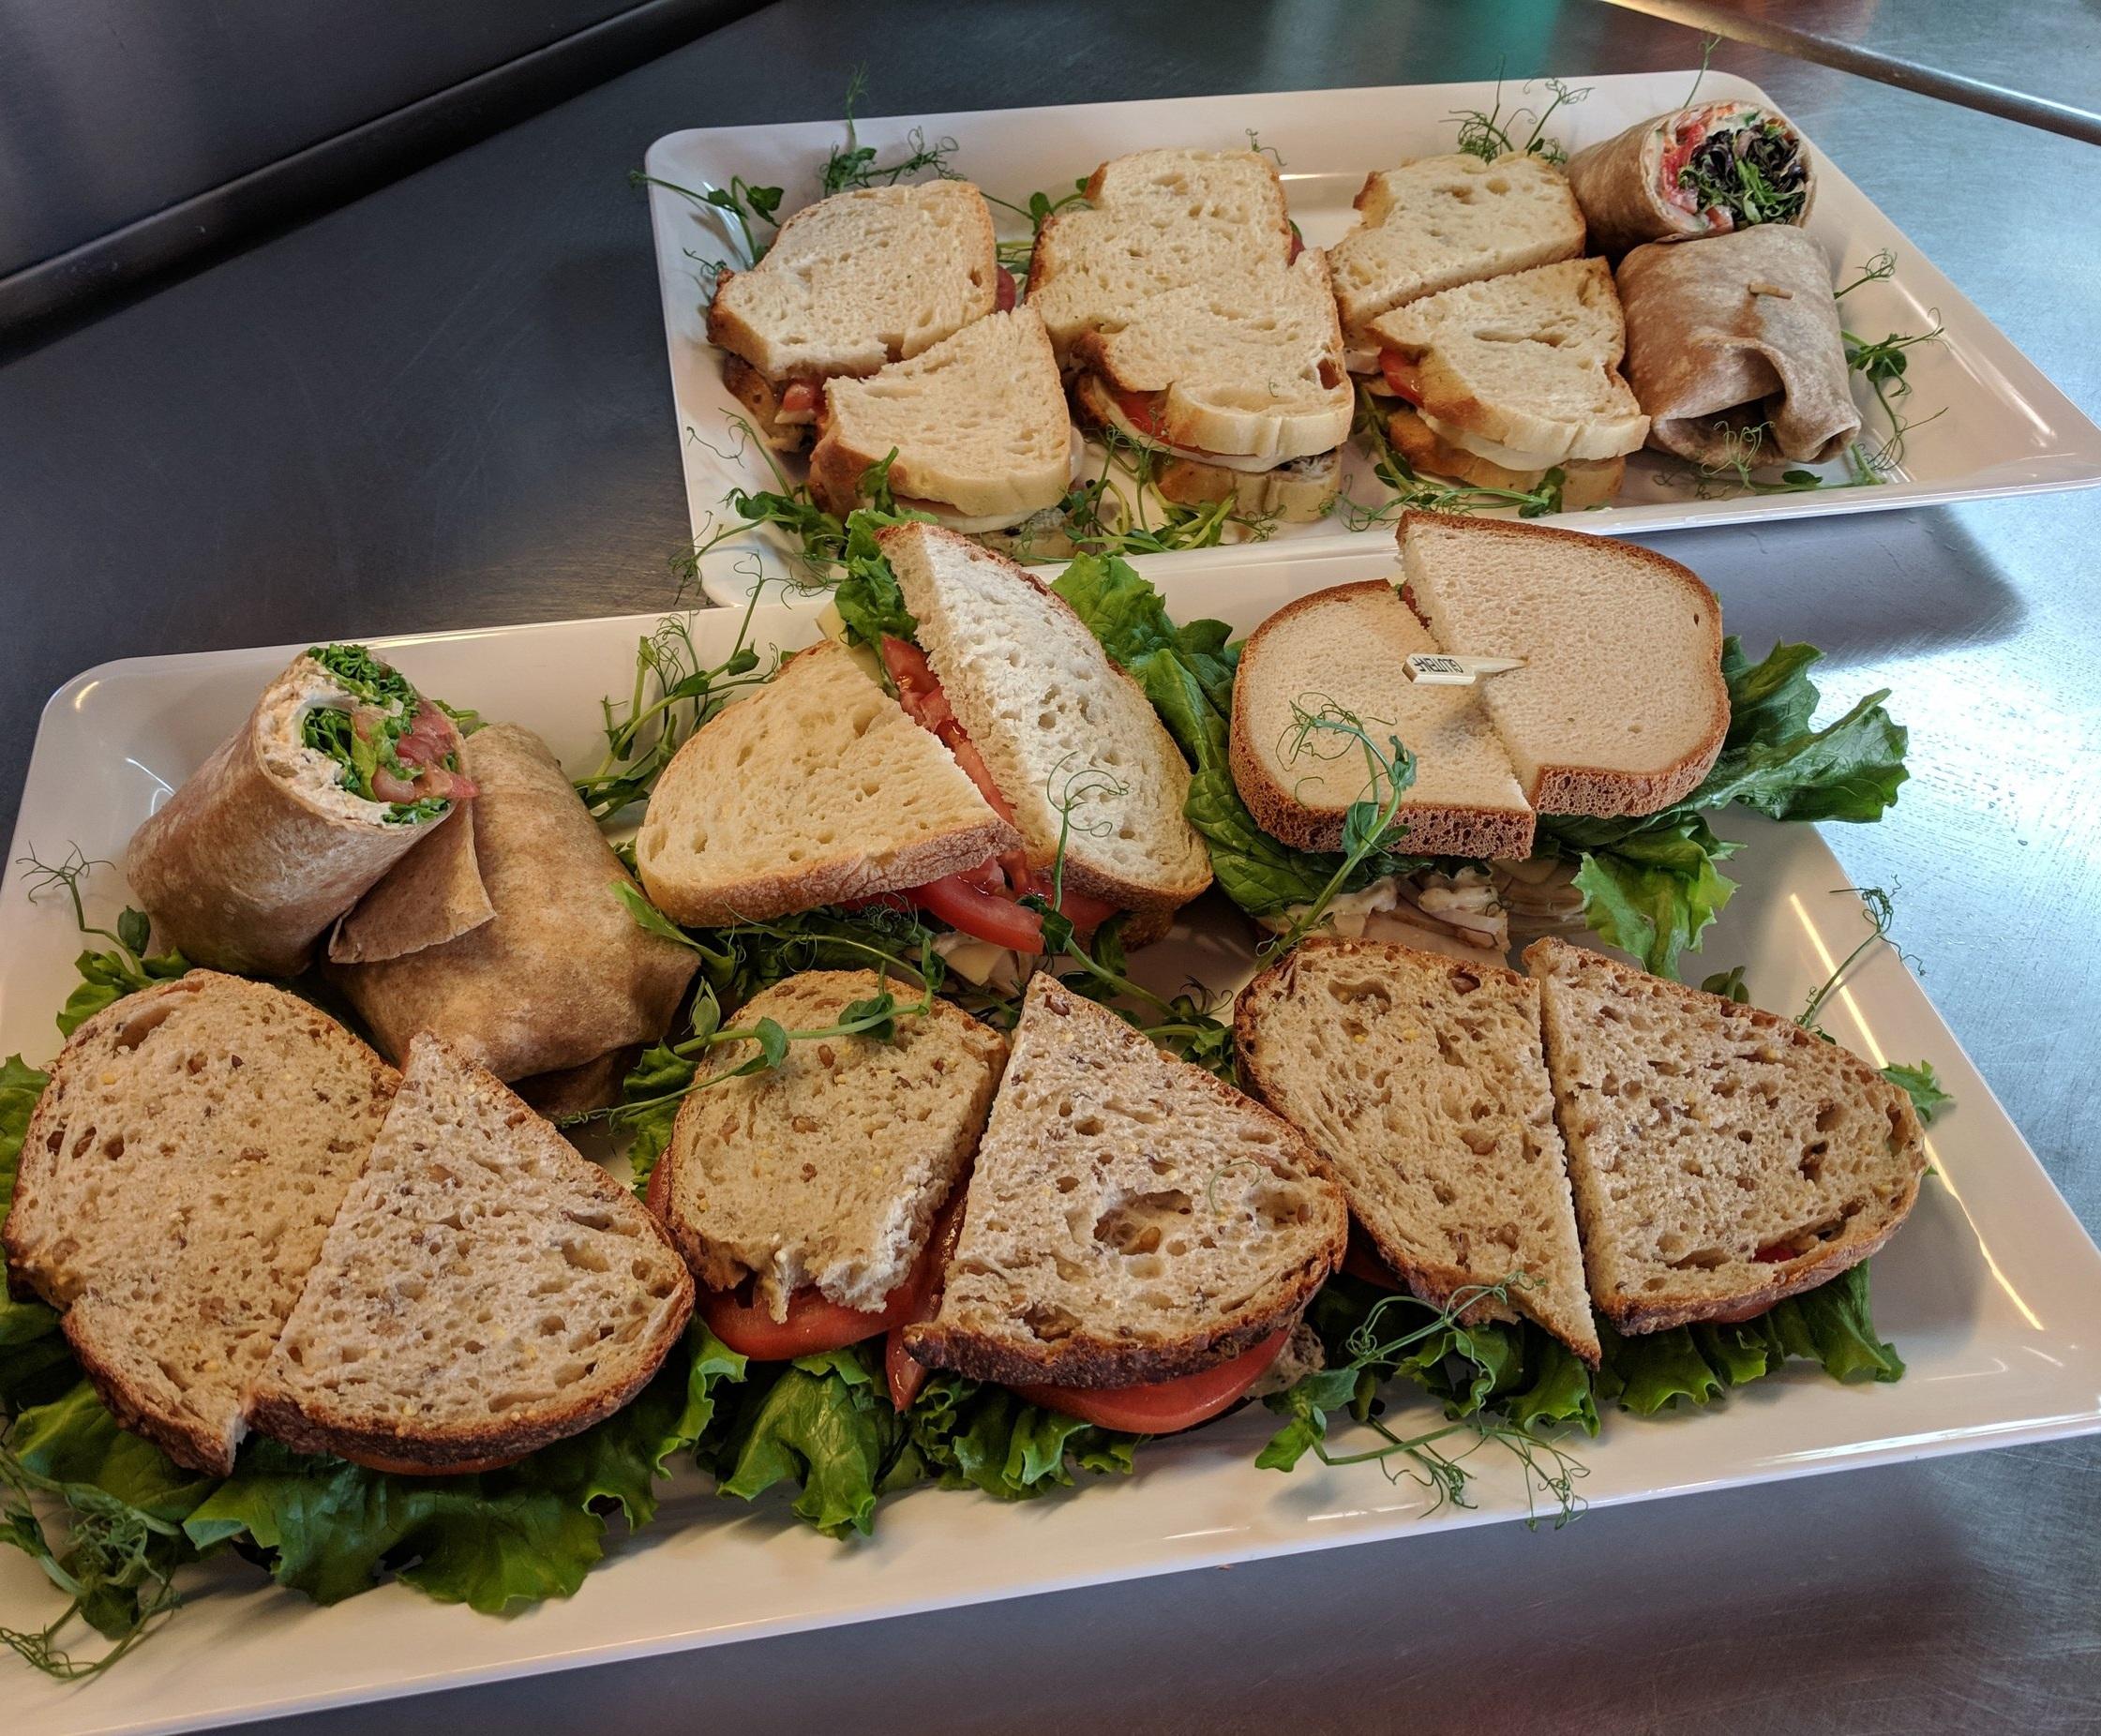 Sandwich Platters  - Vegetarian, vegan, & gluten free options available